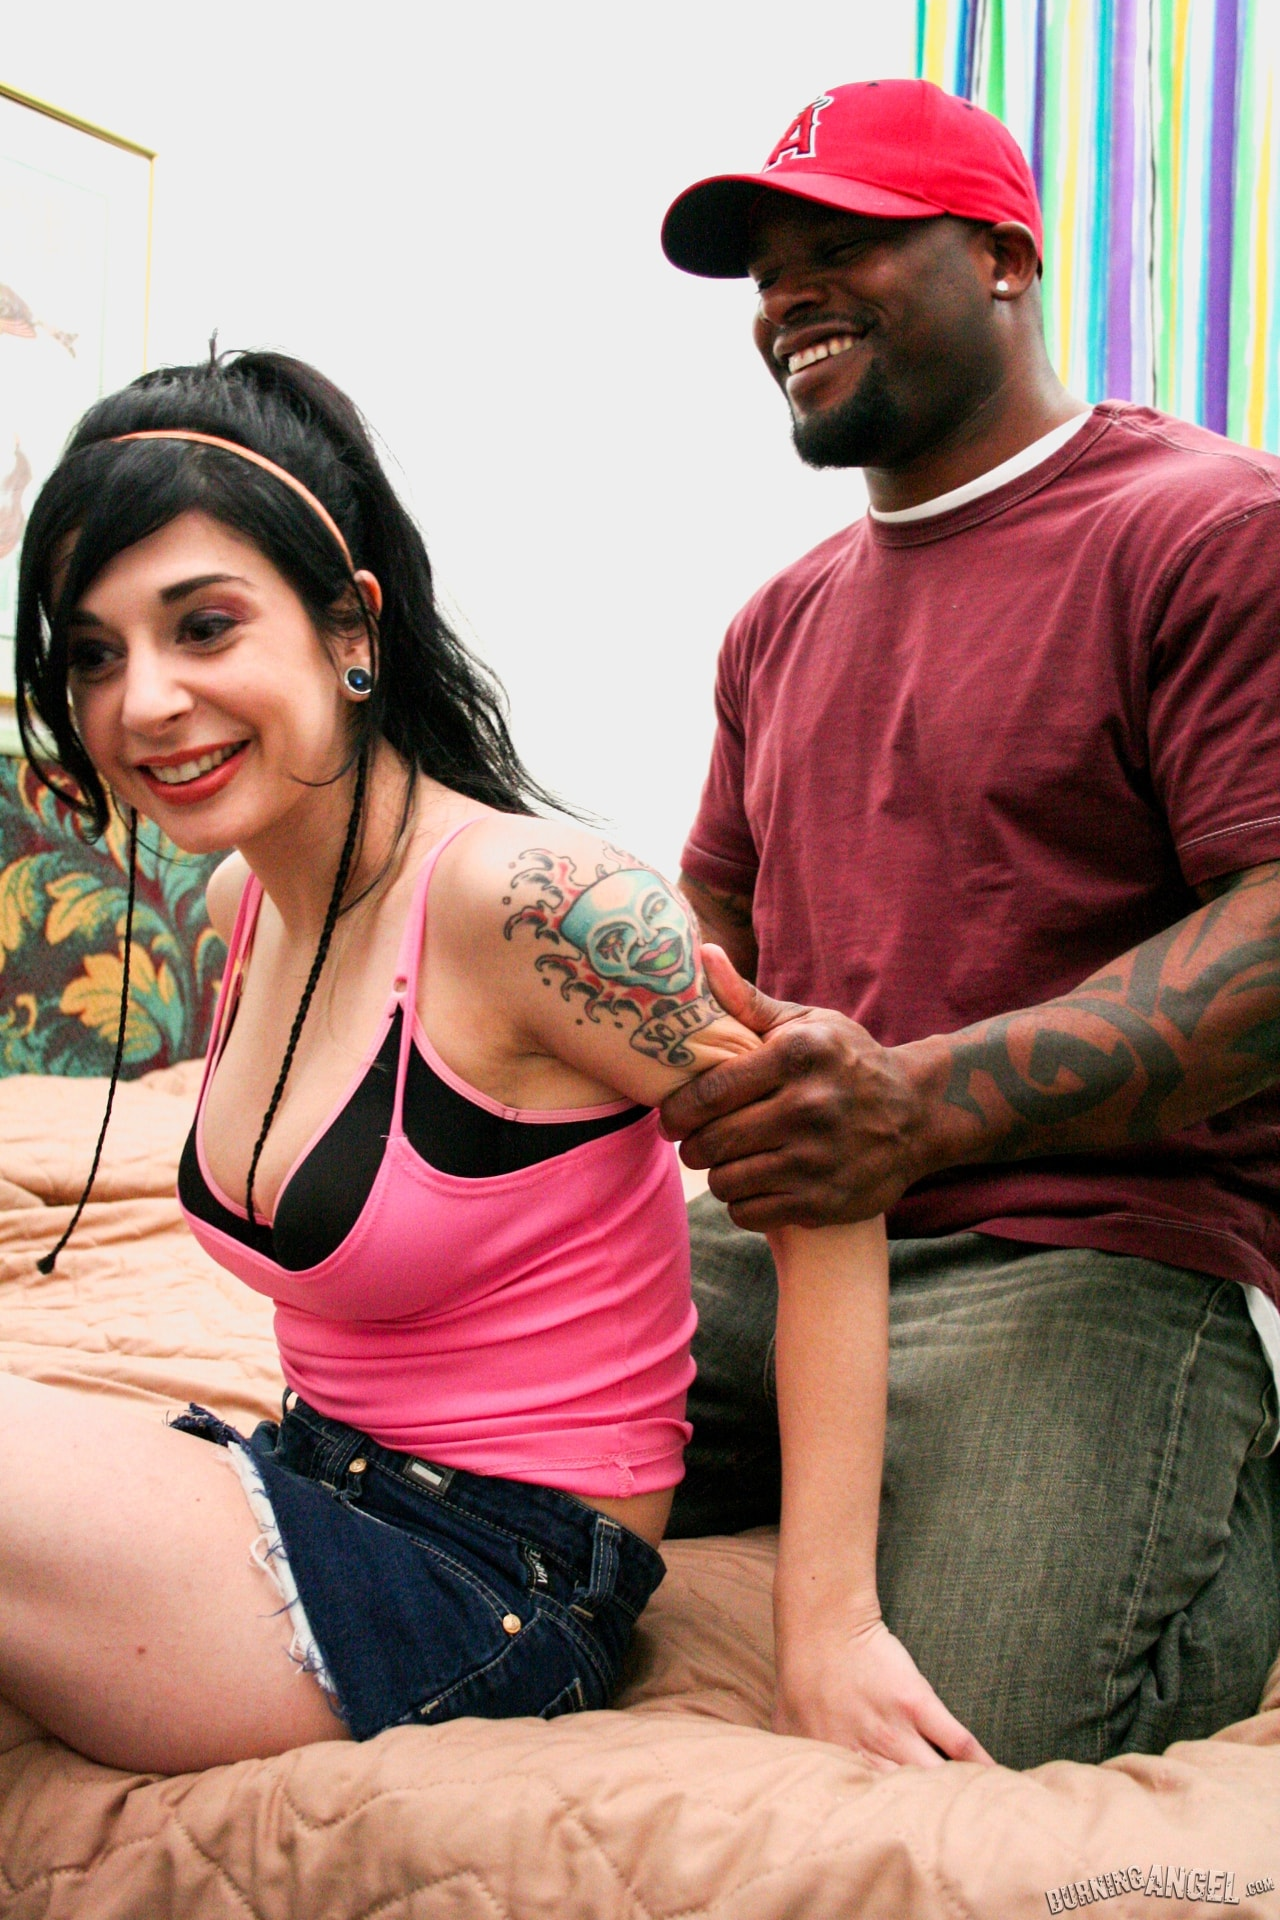 Burning Angel 'It's Big It's Black' starring Joanna Angel (Photo 4)